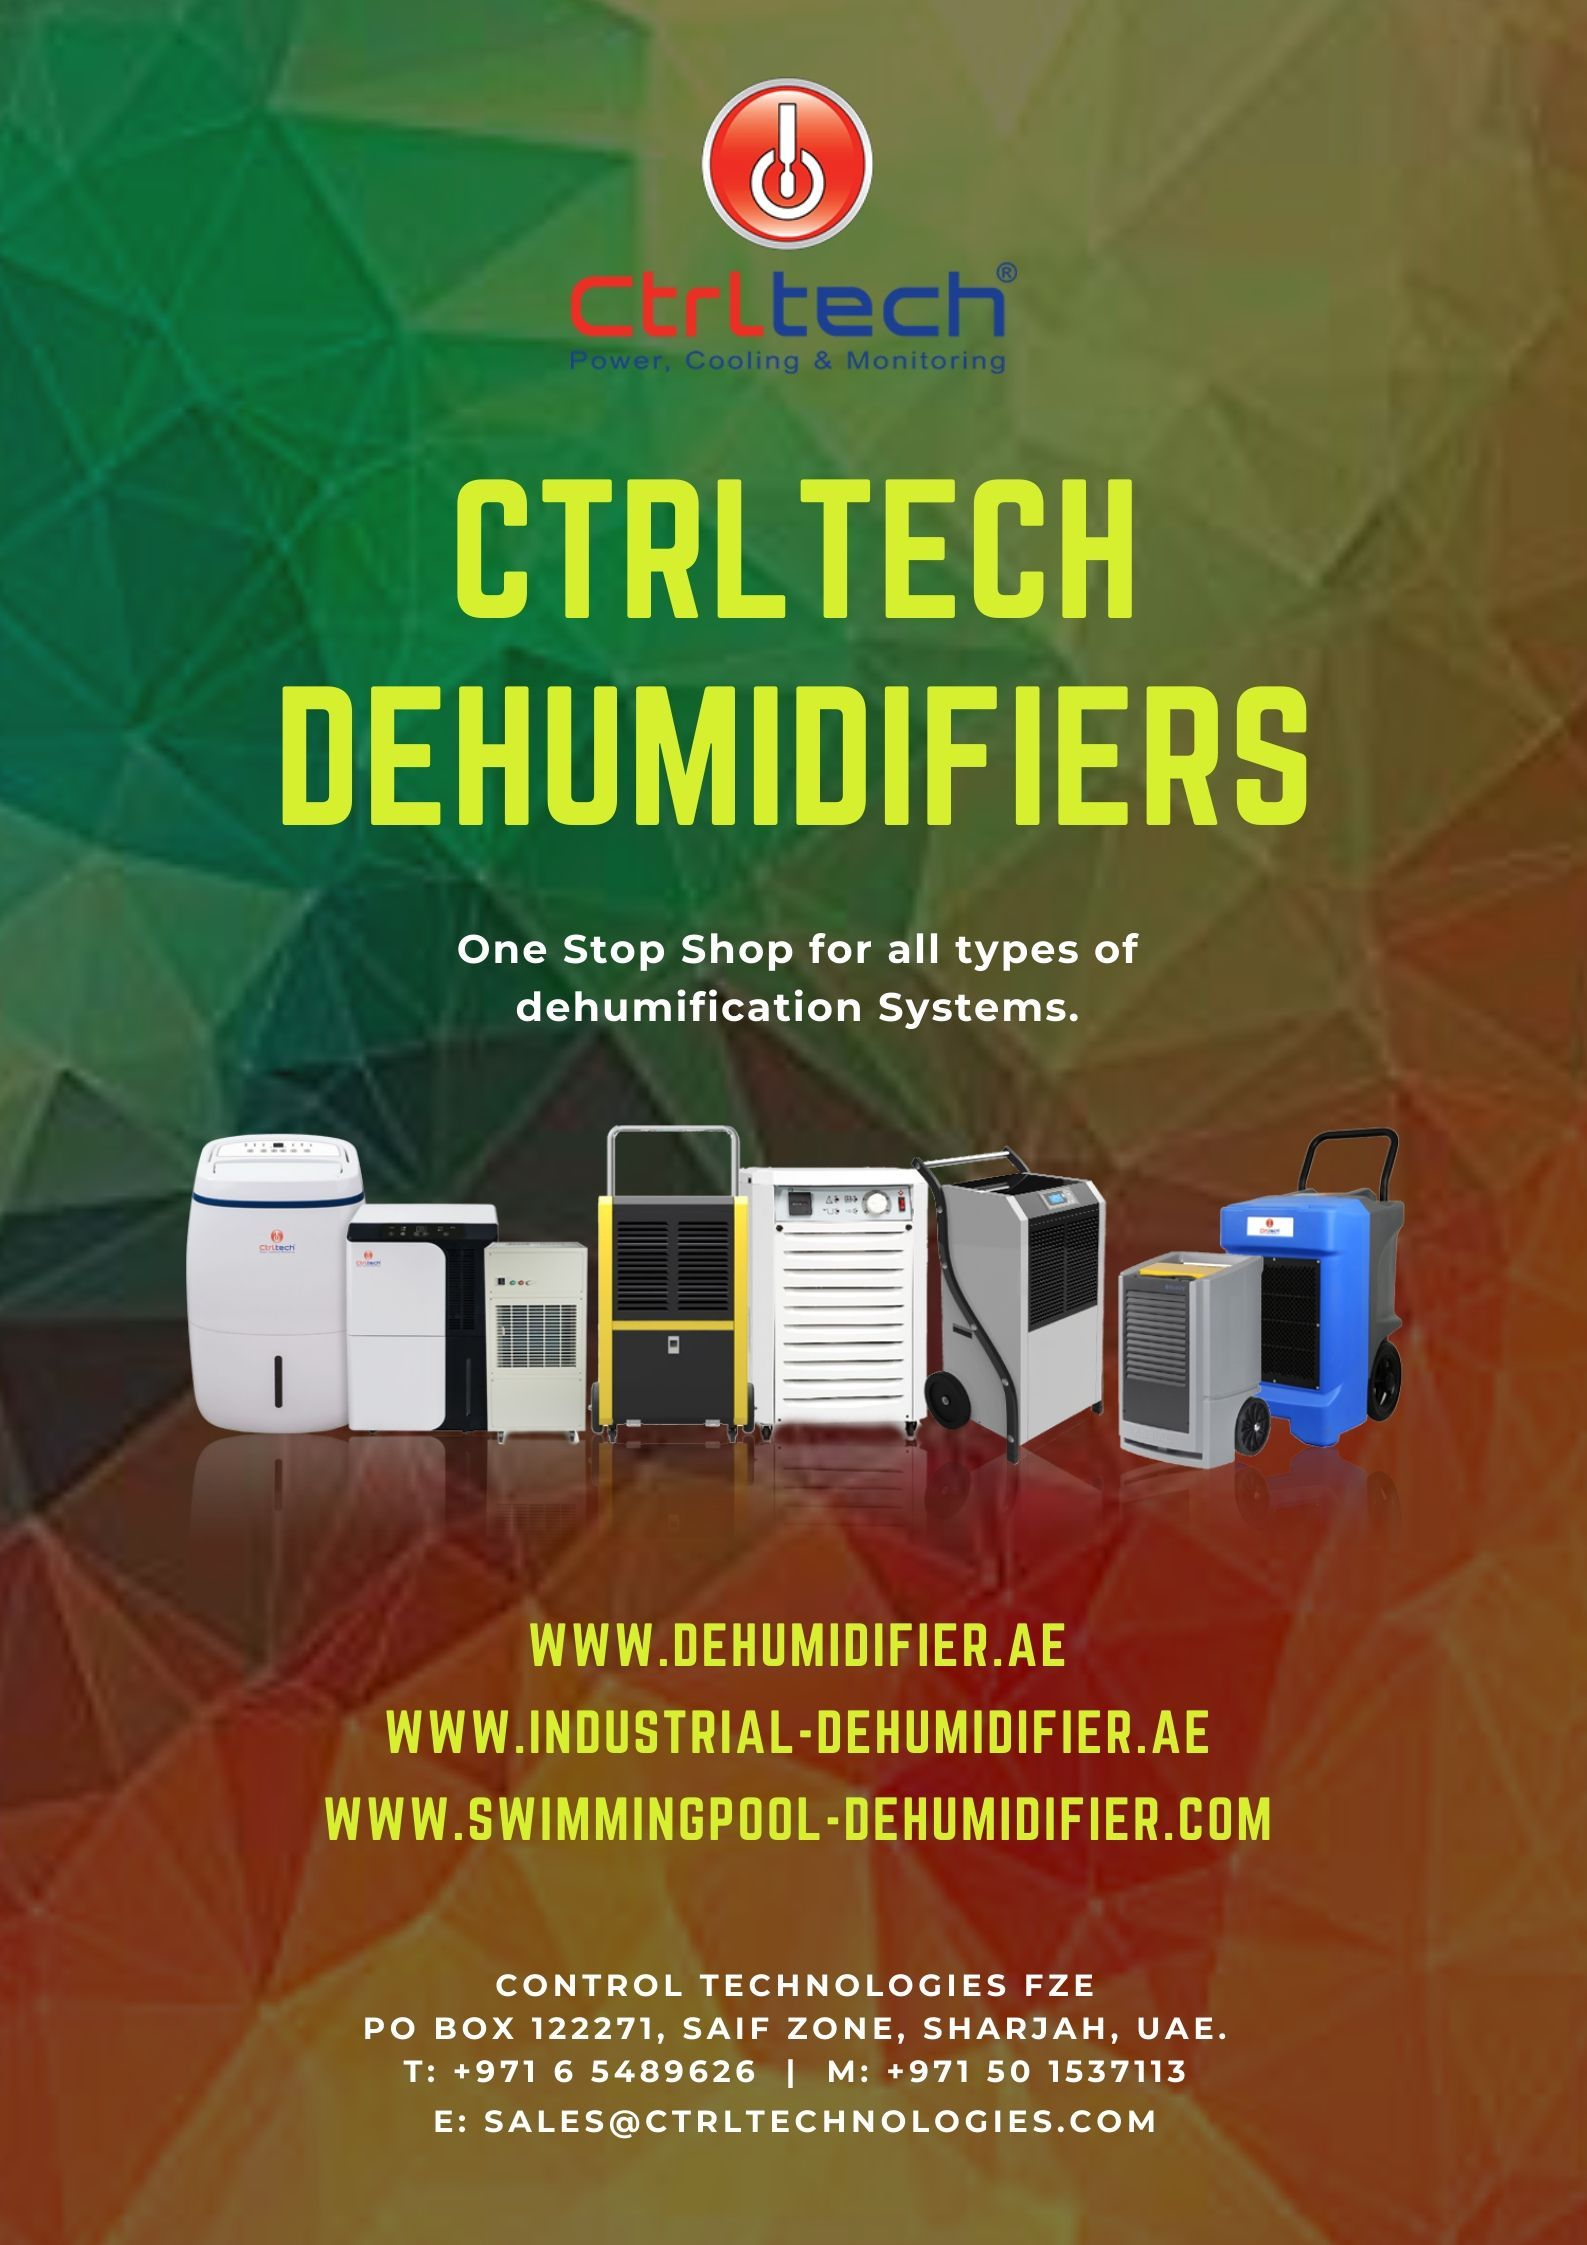 Dehumidifier Supplier In Dubai Uae Oman Saudi Arabia Qatar Bahrain Kuwait Dehumidifiers Swimming Pools Dehumidifier